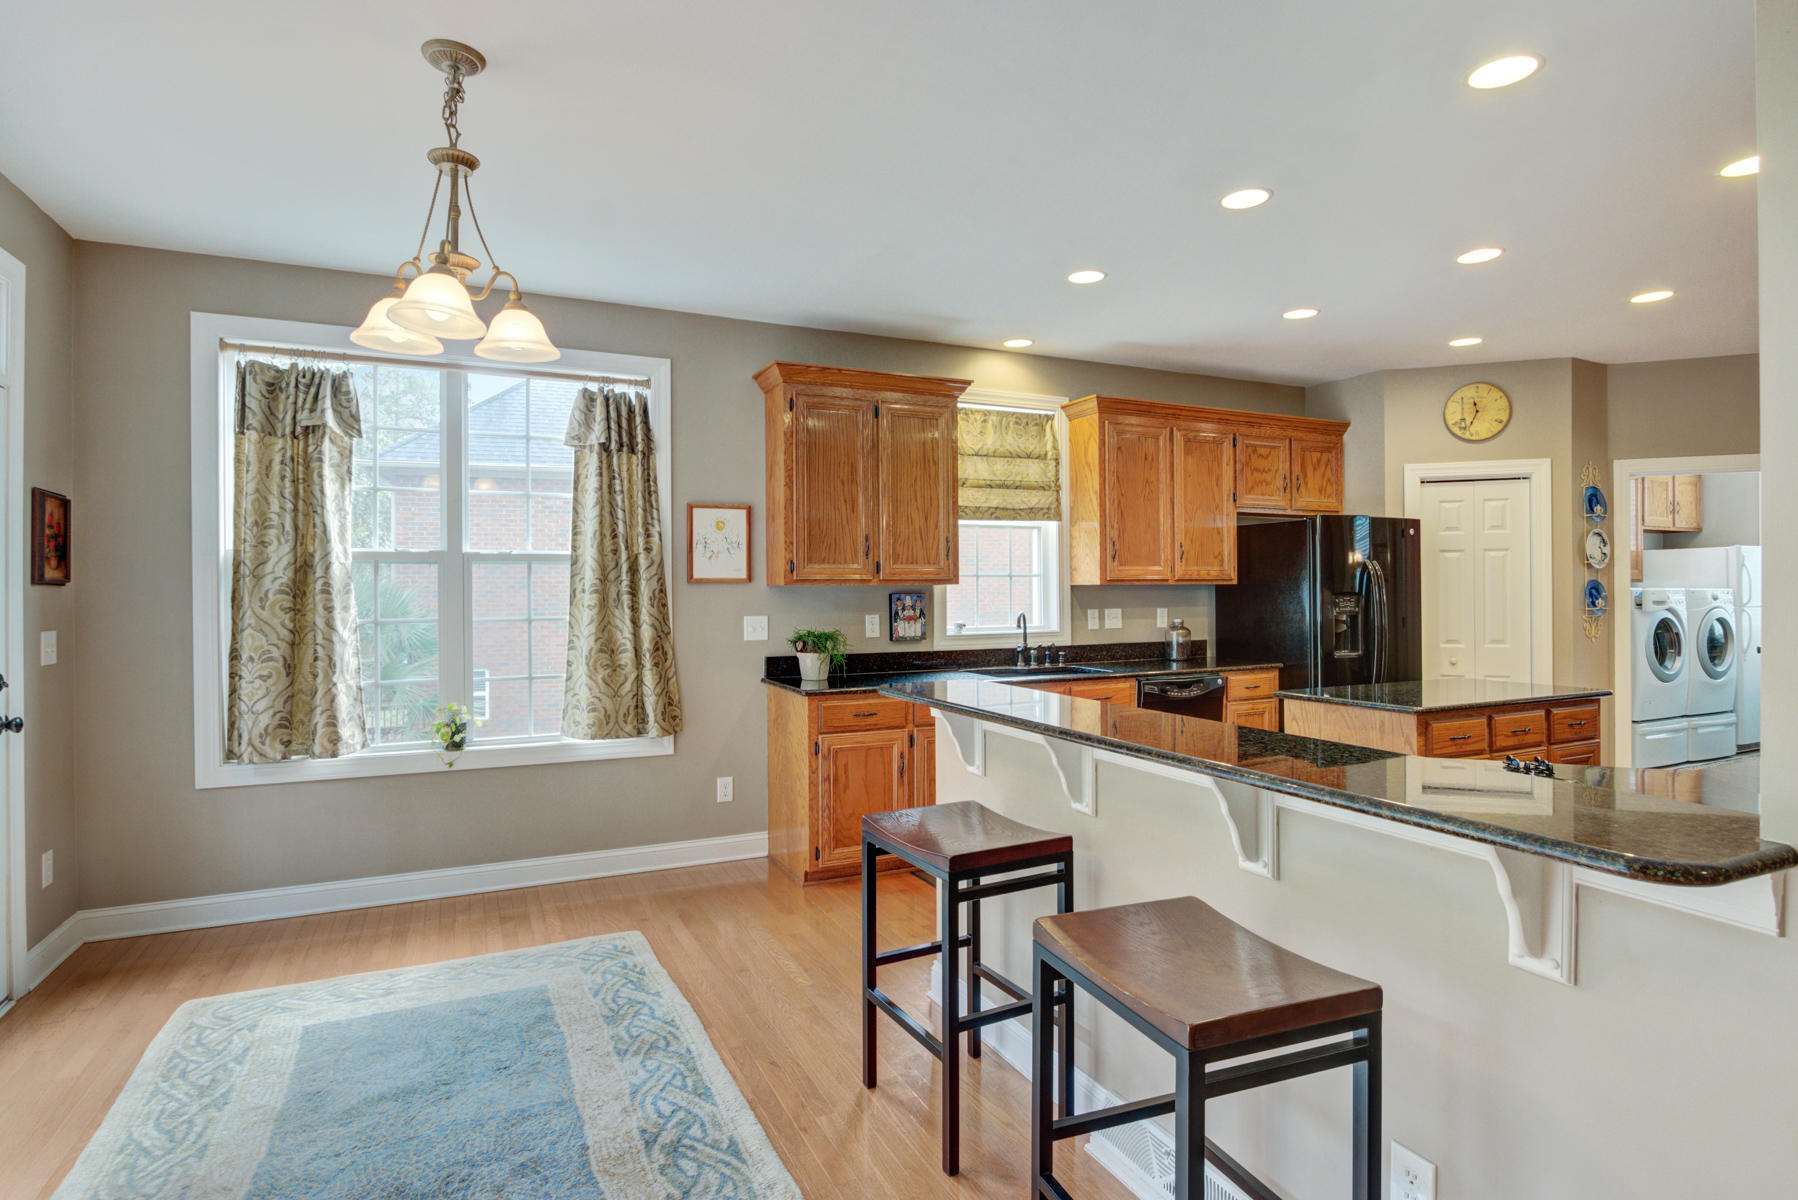 Cedar Grove Homes For Sale - 8733 Millerville, North Charleston, SC - 9